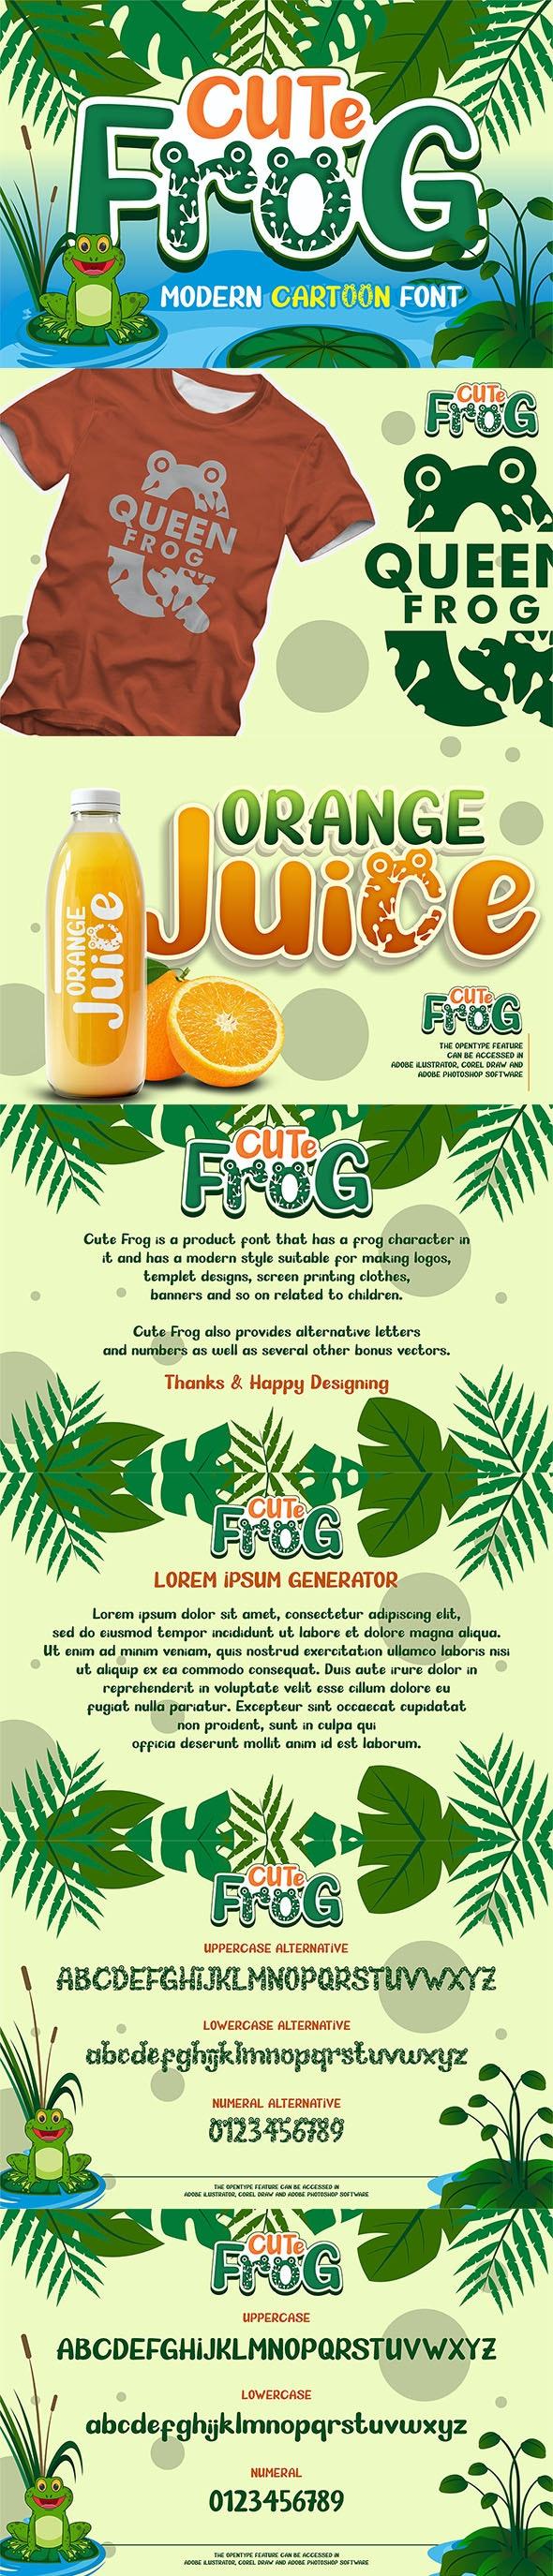 Cute Frog - Craf Font - Fancy Fonts